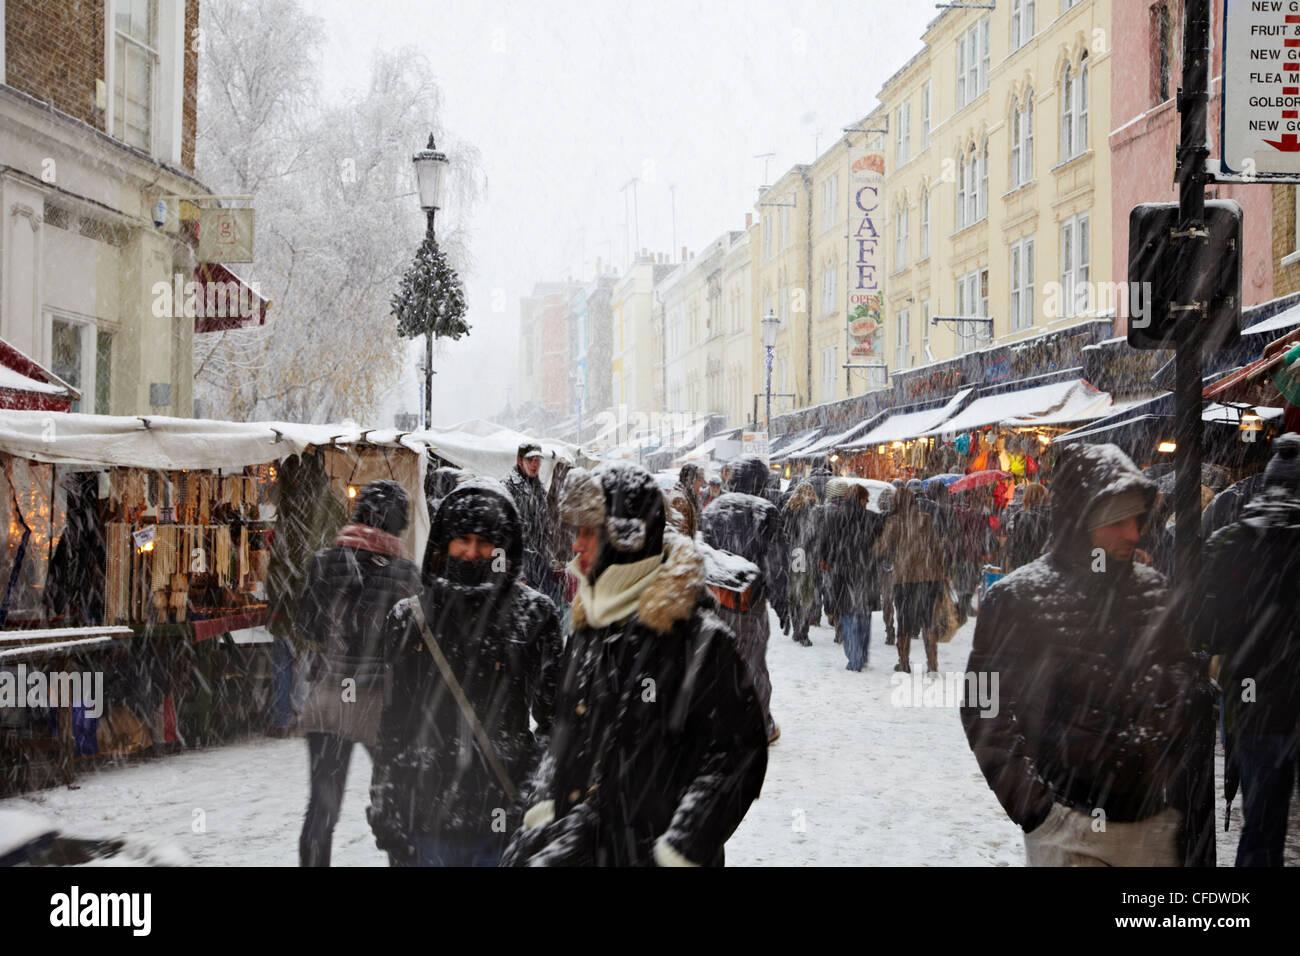 Portobello Road Market in snow, Notting Hill, London, England, United Kingdom, Europe - Stock Image